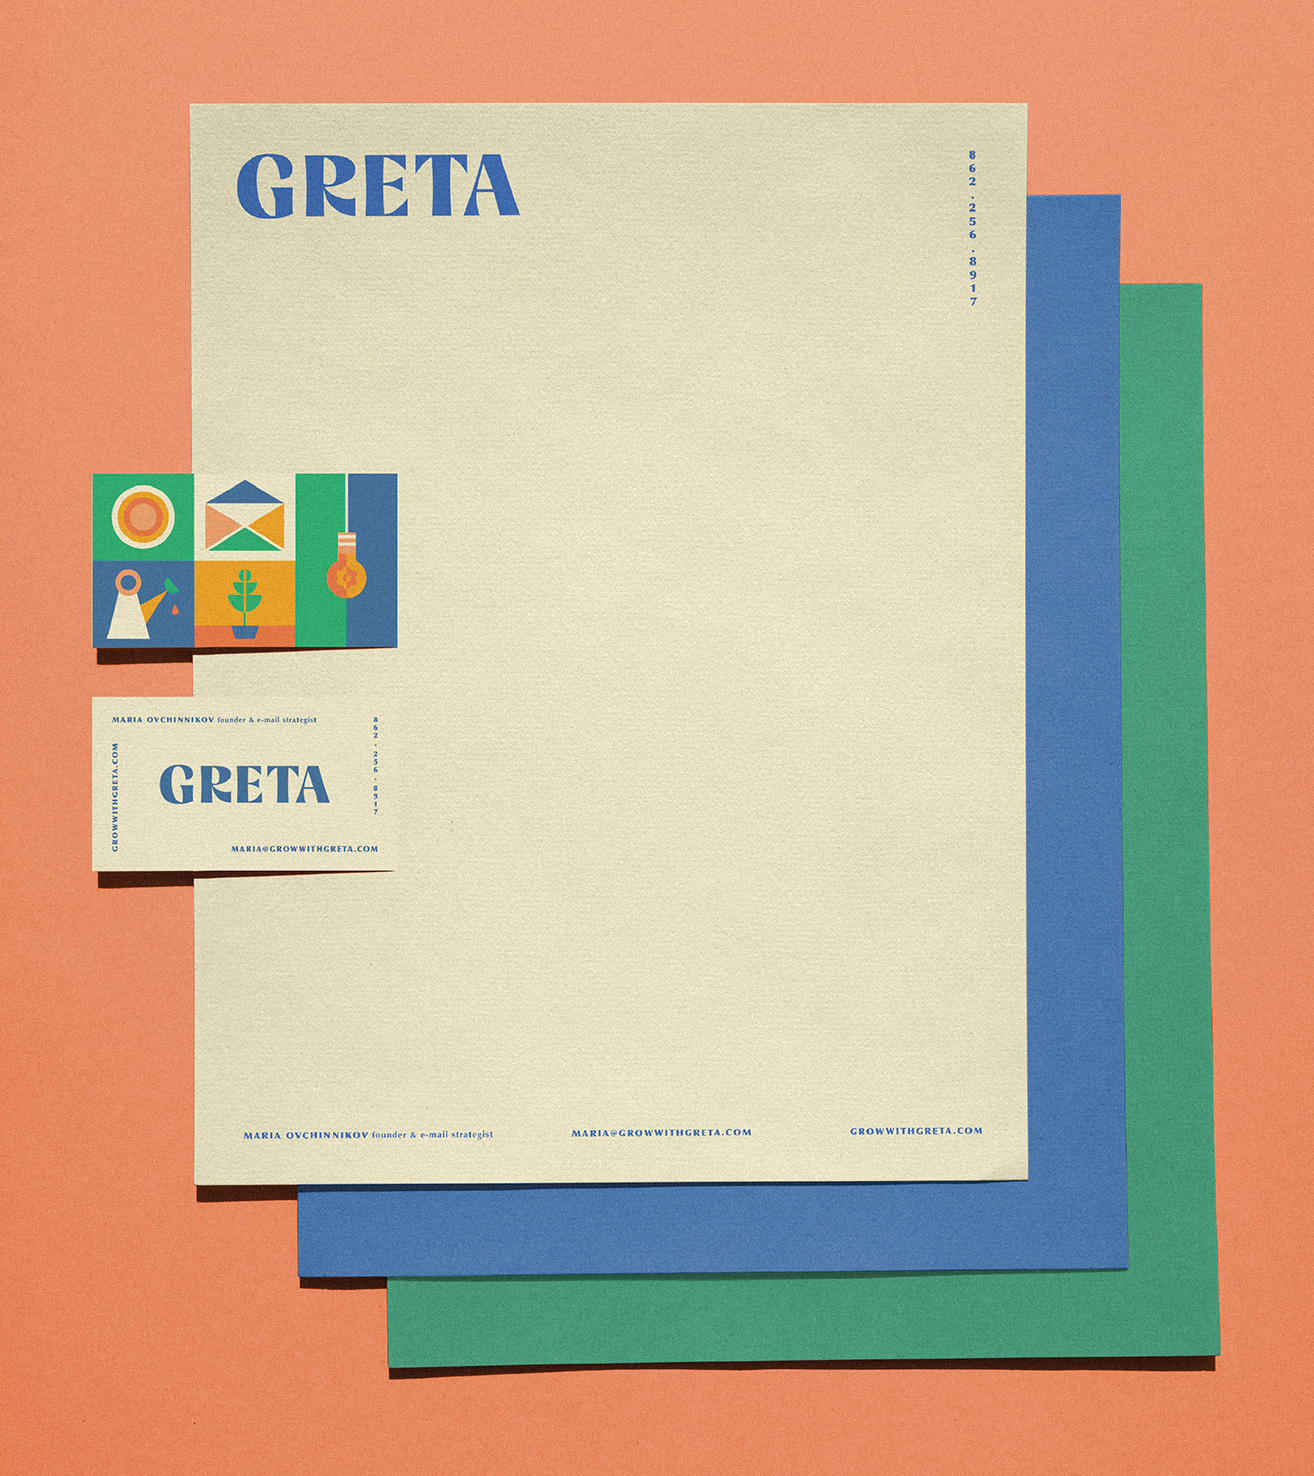 MGS_Greta_004